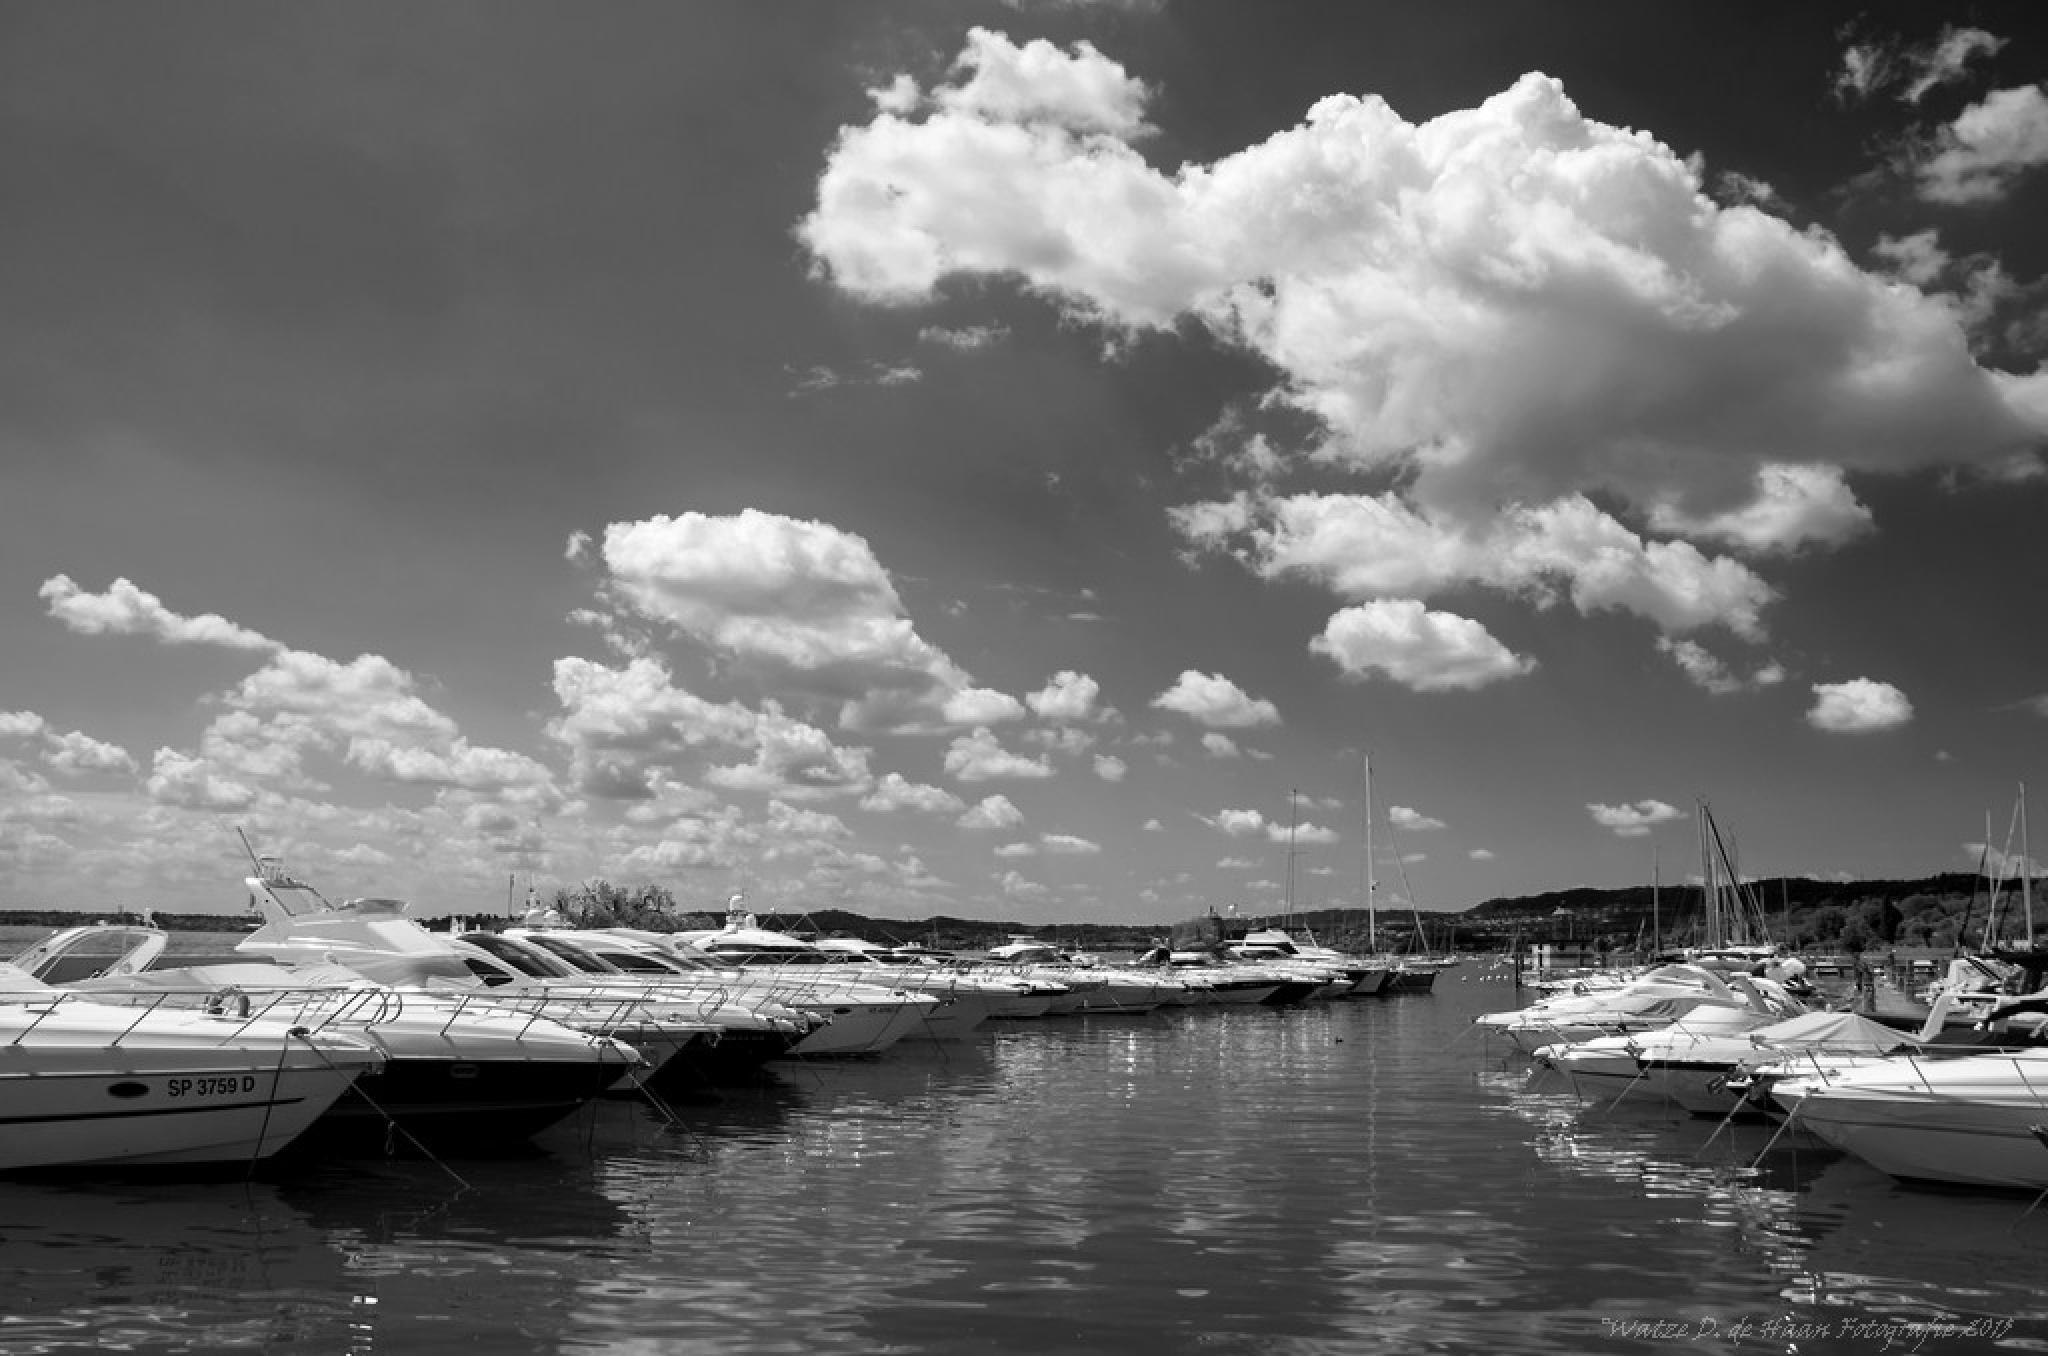 Lake Garda Italy VII by Watze D. de Haan